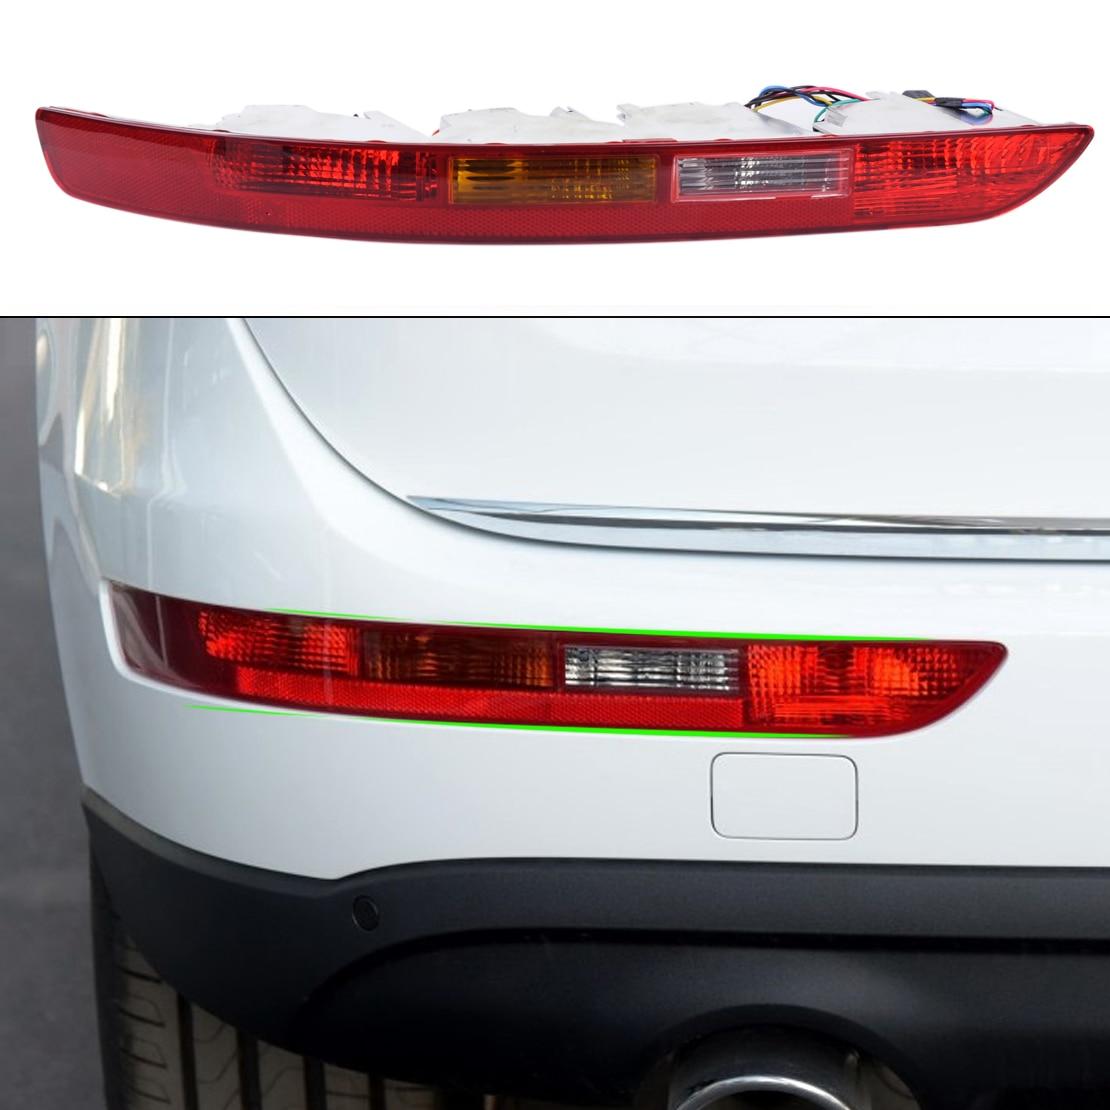 DWCX Rear Left Side Lower Bumper Taillight Lamp Reverse Fog Lamp Assembly for Audi Q5 2009 2010 2011 2012 2013 2014 2015 2016